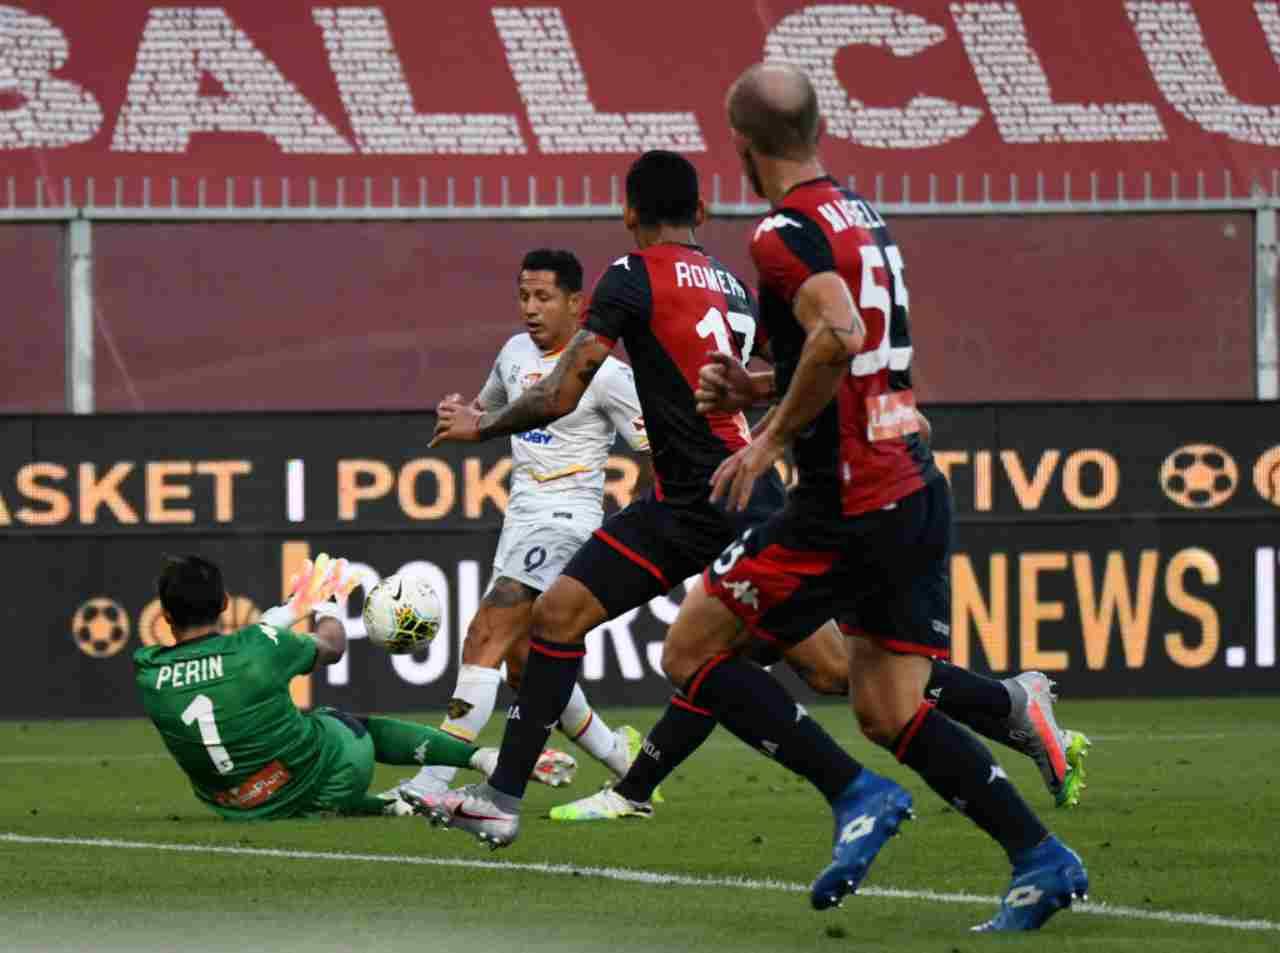 Serie A, highlights Genoa-Lecce: gol e sintesi partita - Video